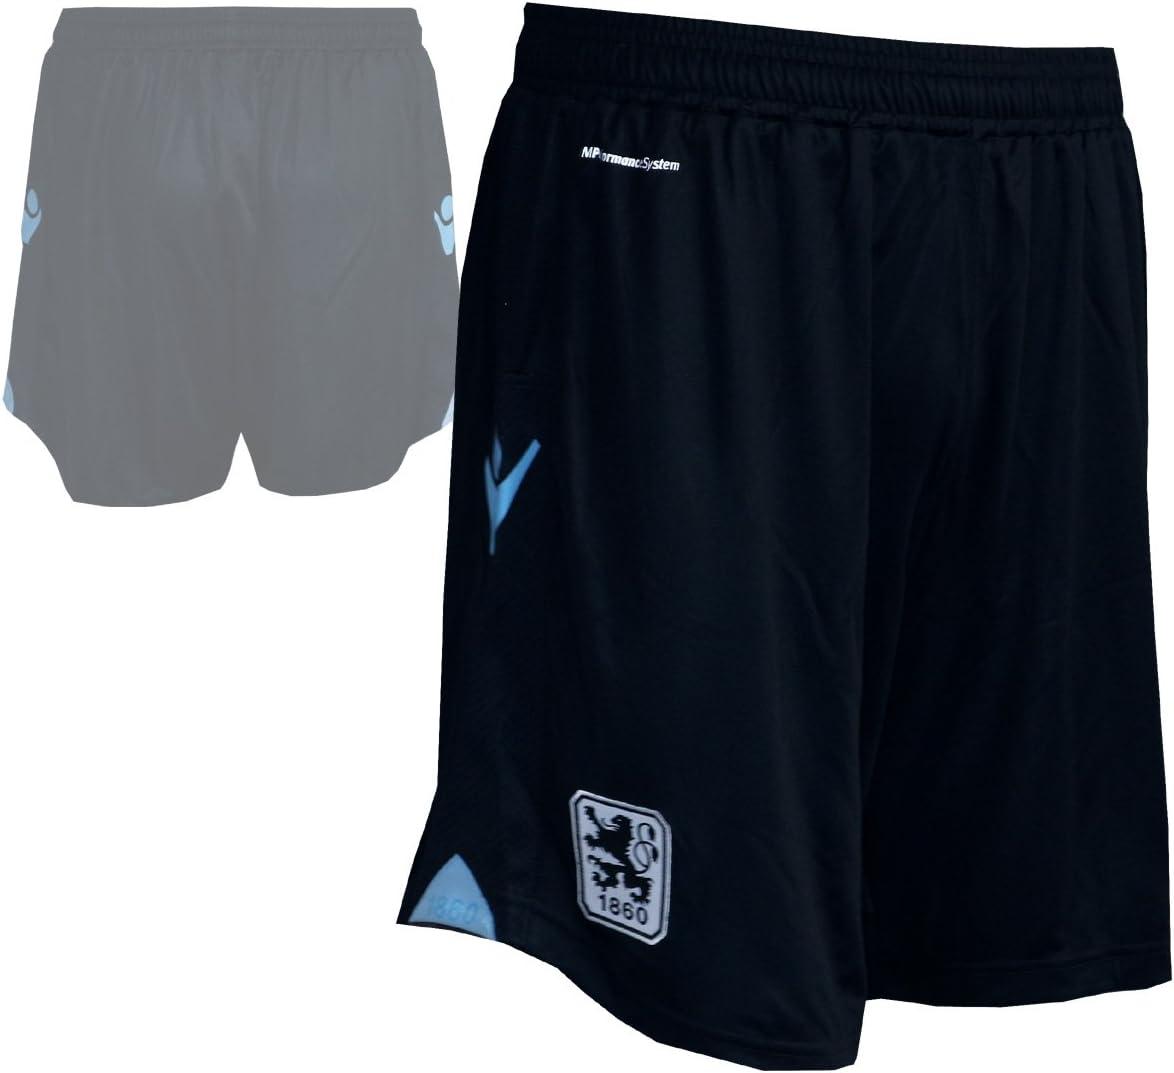 Macron TSV 1860 M/ünchen Authentic Away Short Spielerhose L/öwen Turnhose Fu/ßball-Hose schwarz